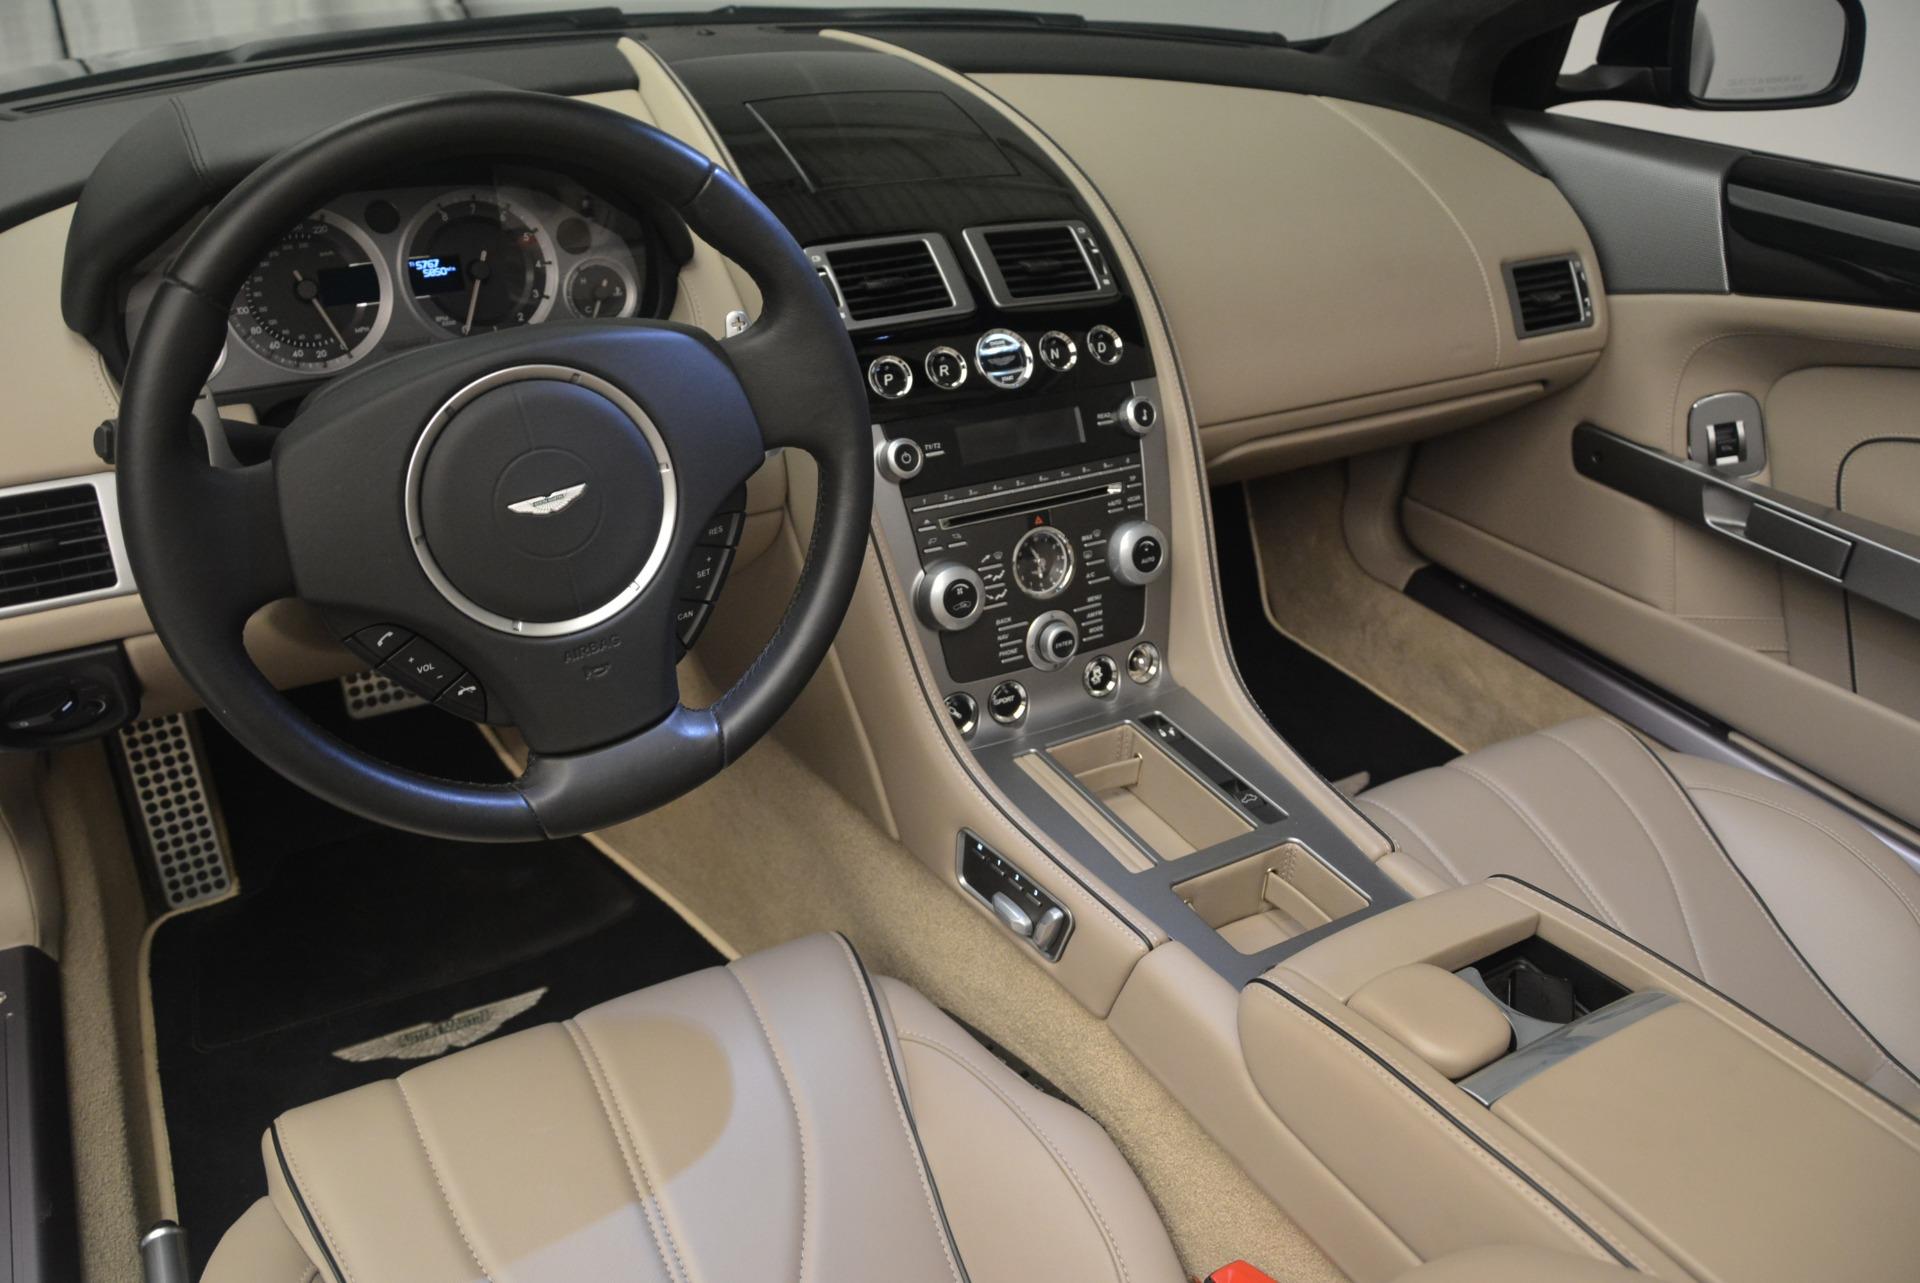 Used 2015 Aston Martin DB9 Volante For Sale In Westport, CT 2318_p20